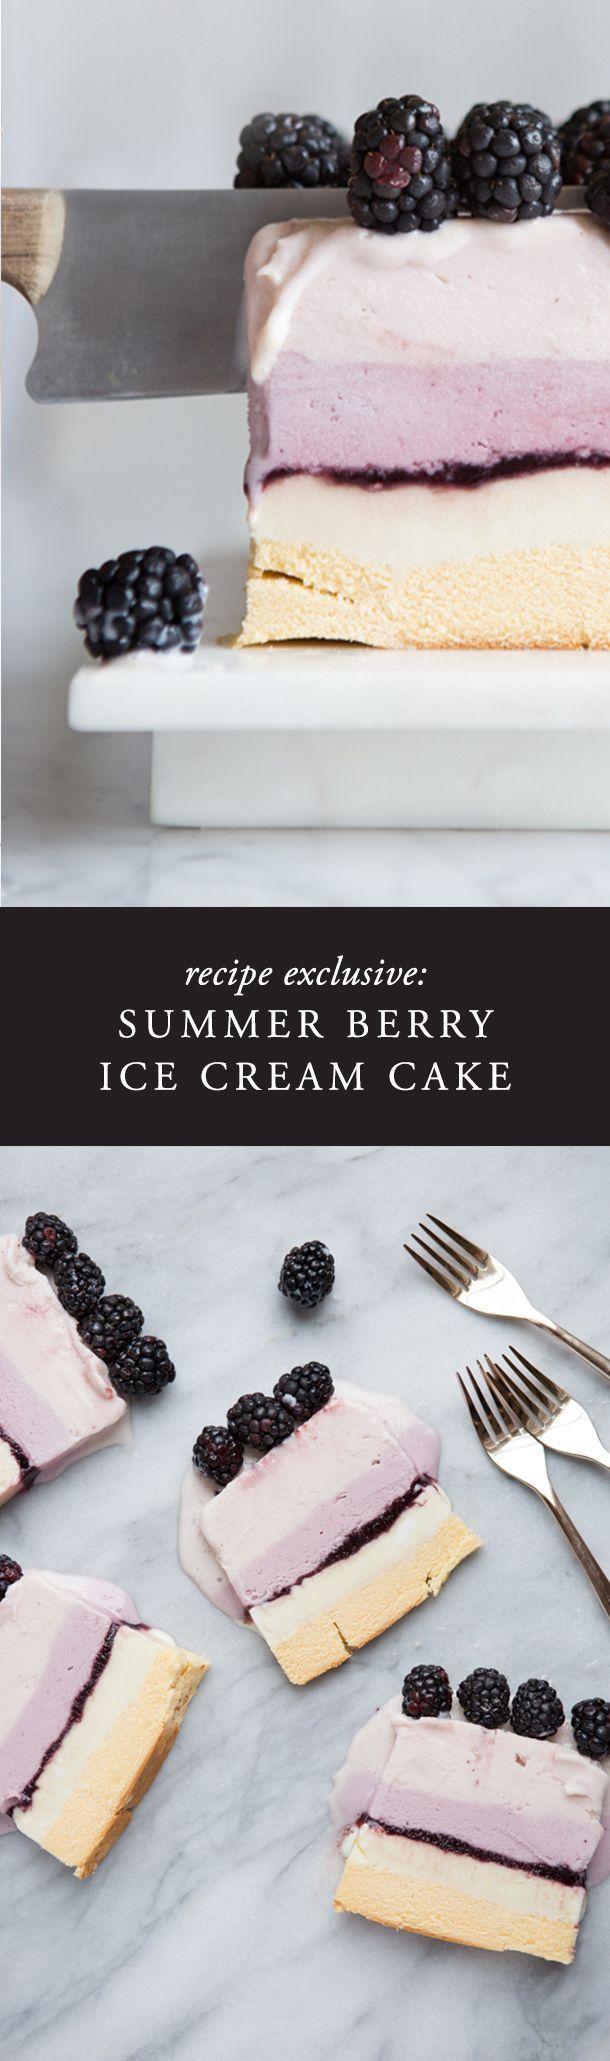 From Camille\'s Kitchen :: Summer Berry Ice Cream Cake | Cream cake ...